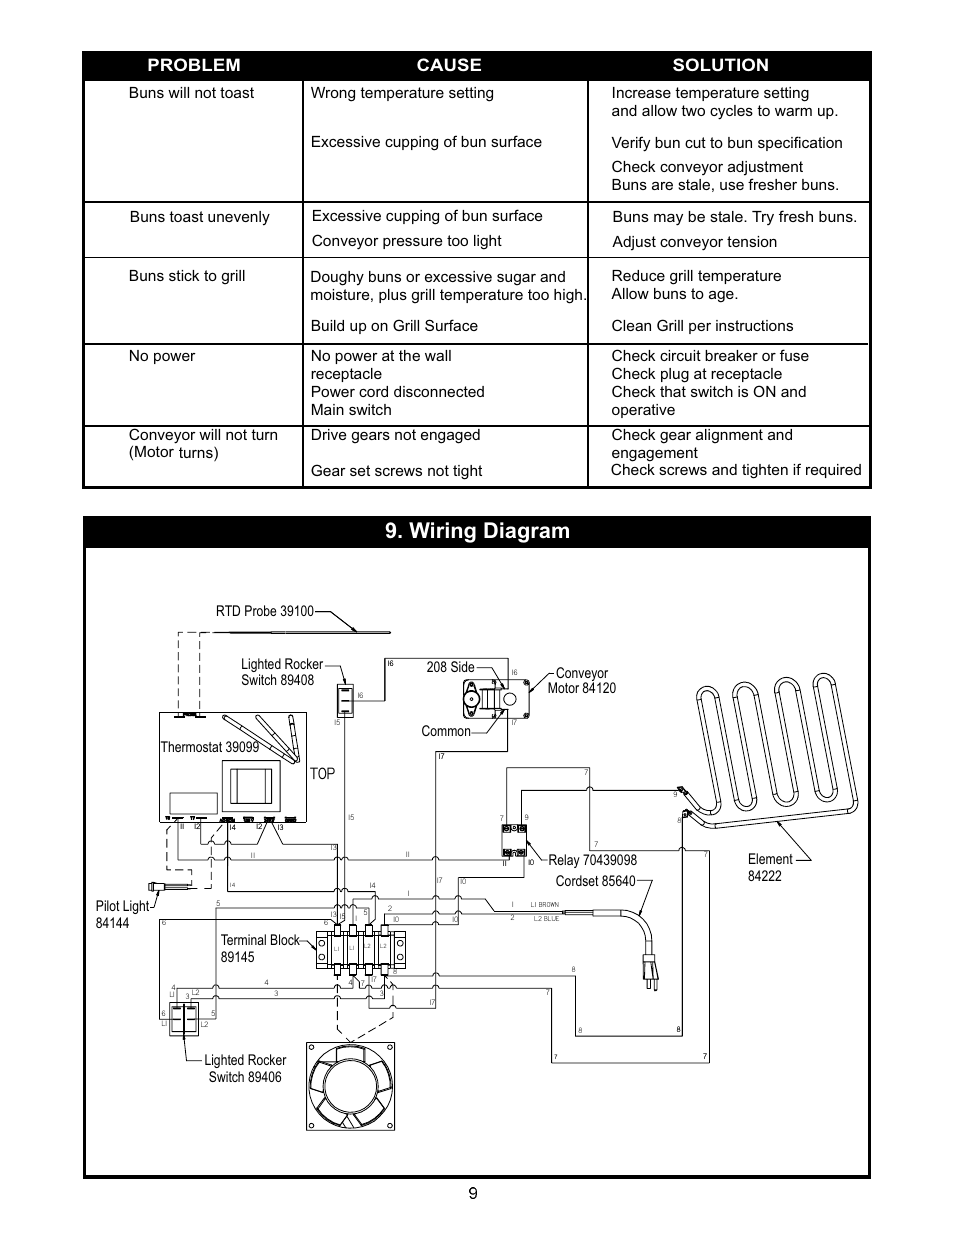 medium resolution of wiring diagram problem cause solution apw wyott m95 2 jib user manual page 9 12